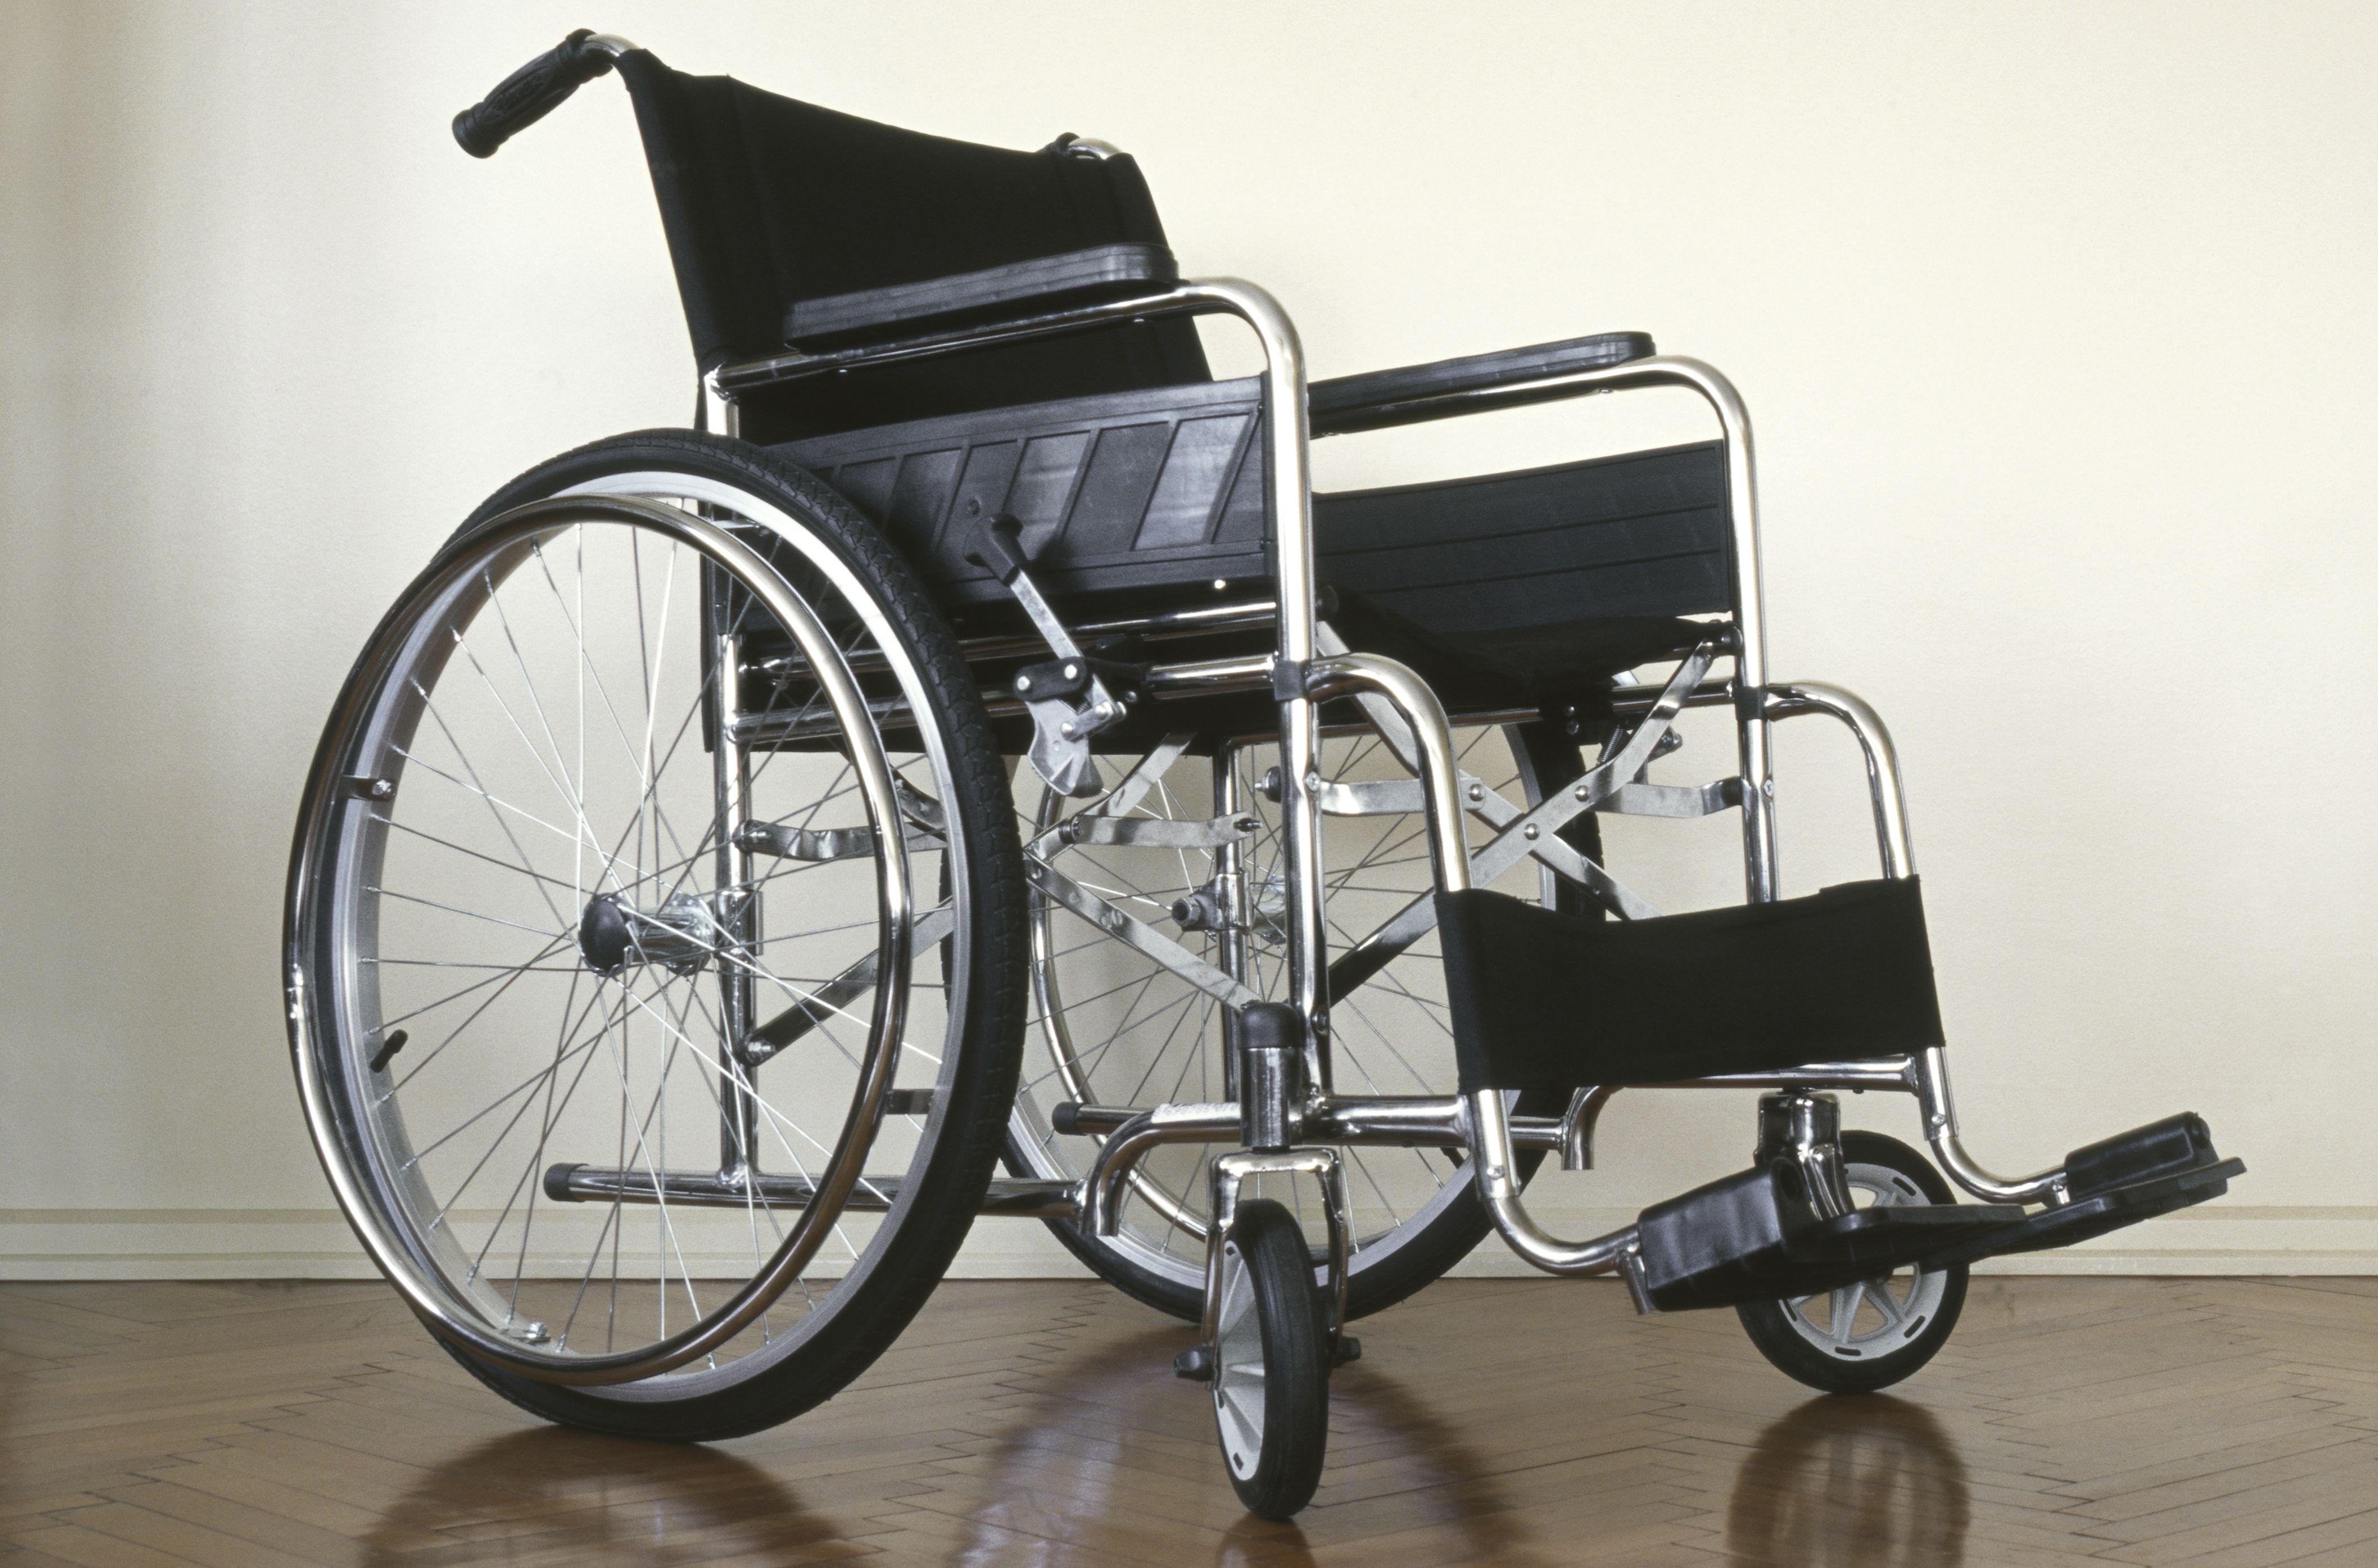 Ortopedia con sillas de ruedas